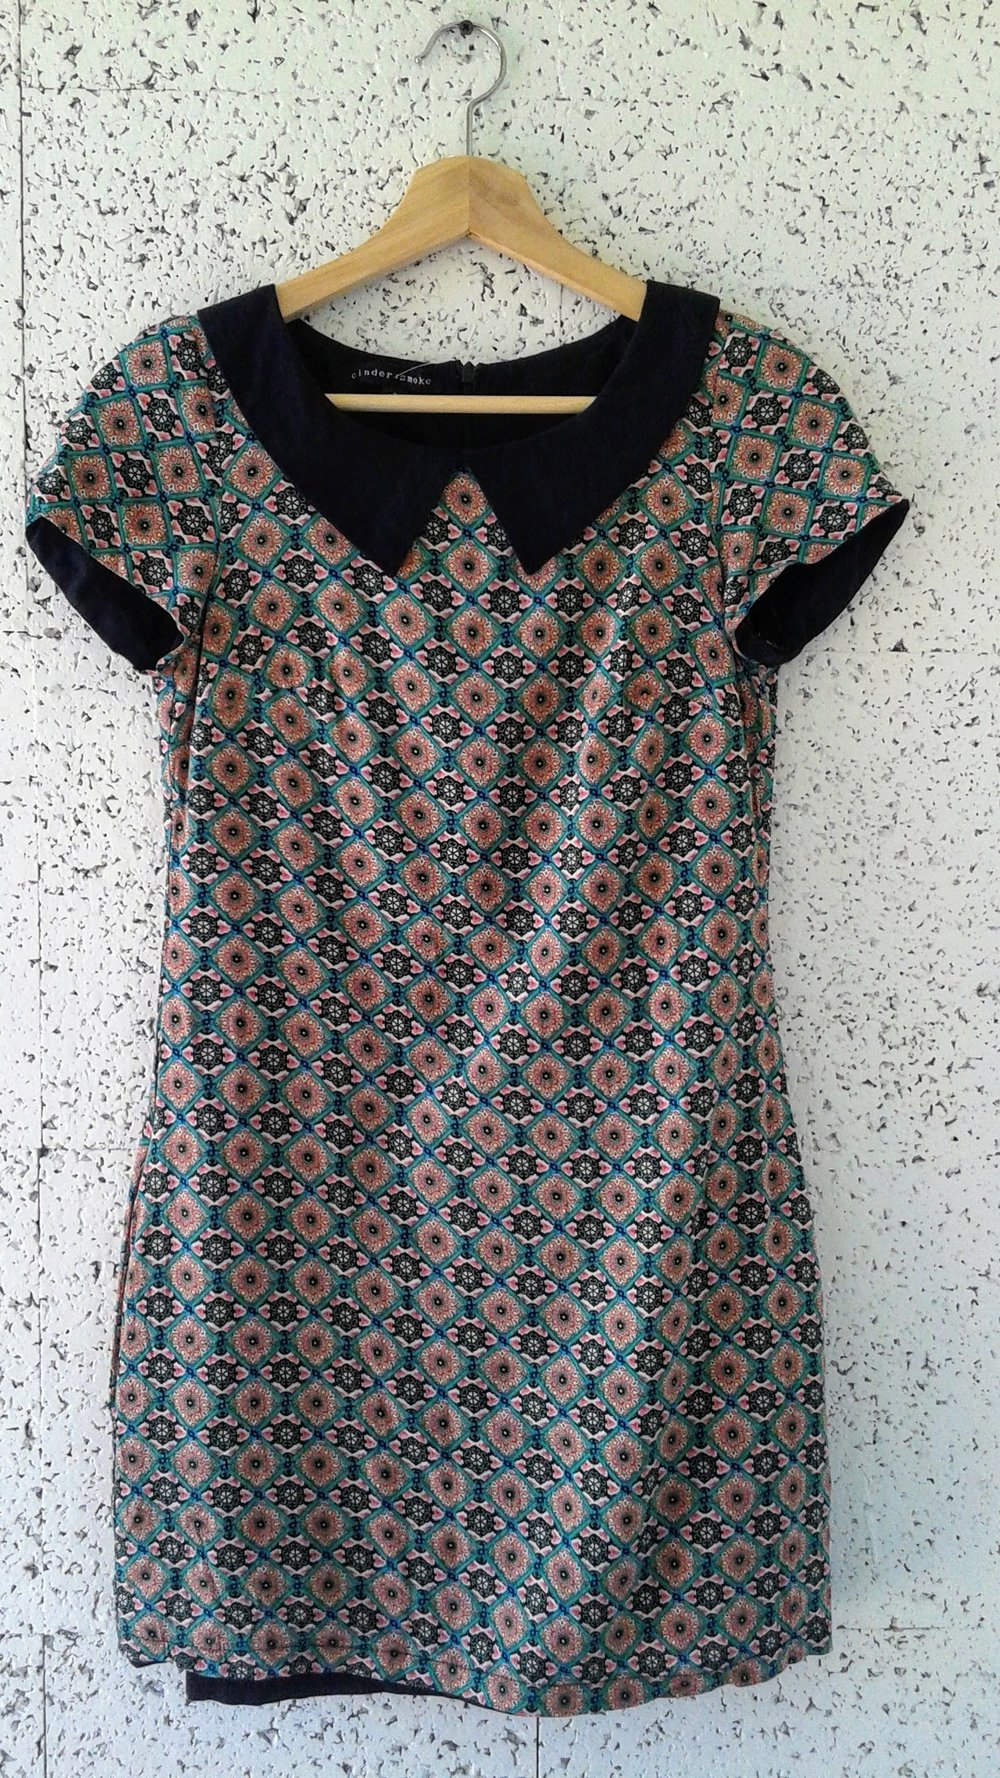 Cinder+Smoke dress; Size XS, $30